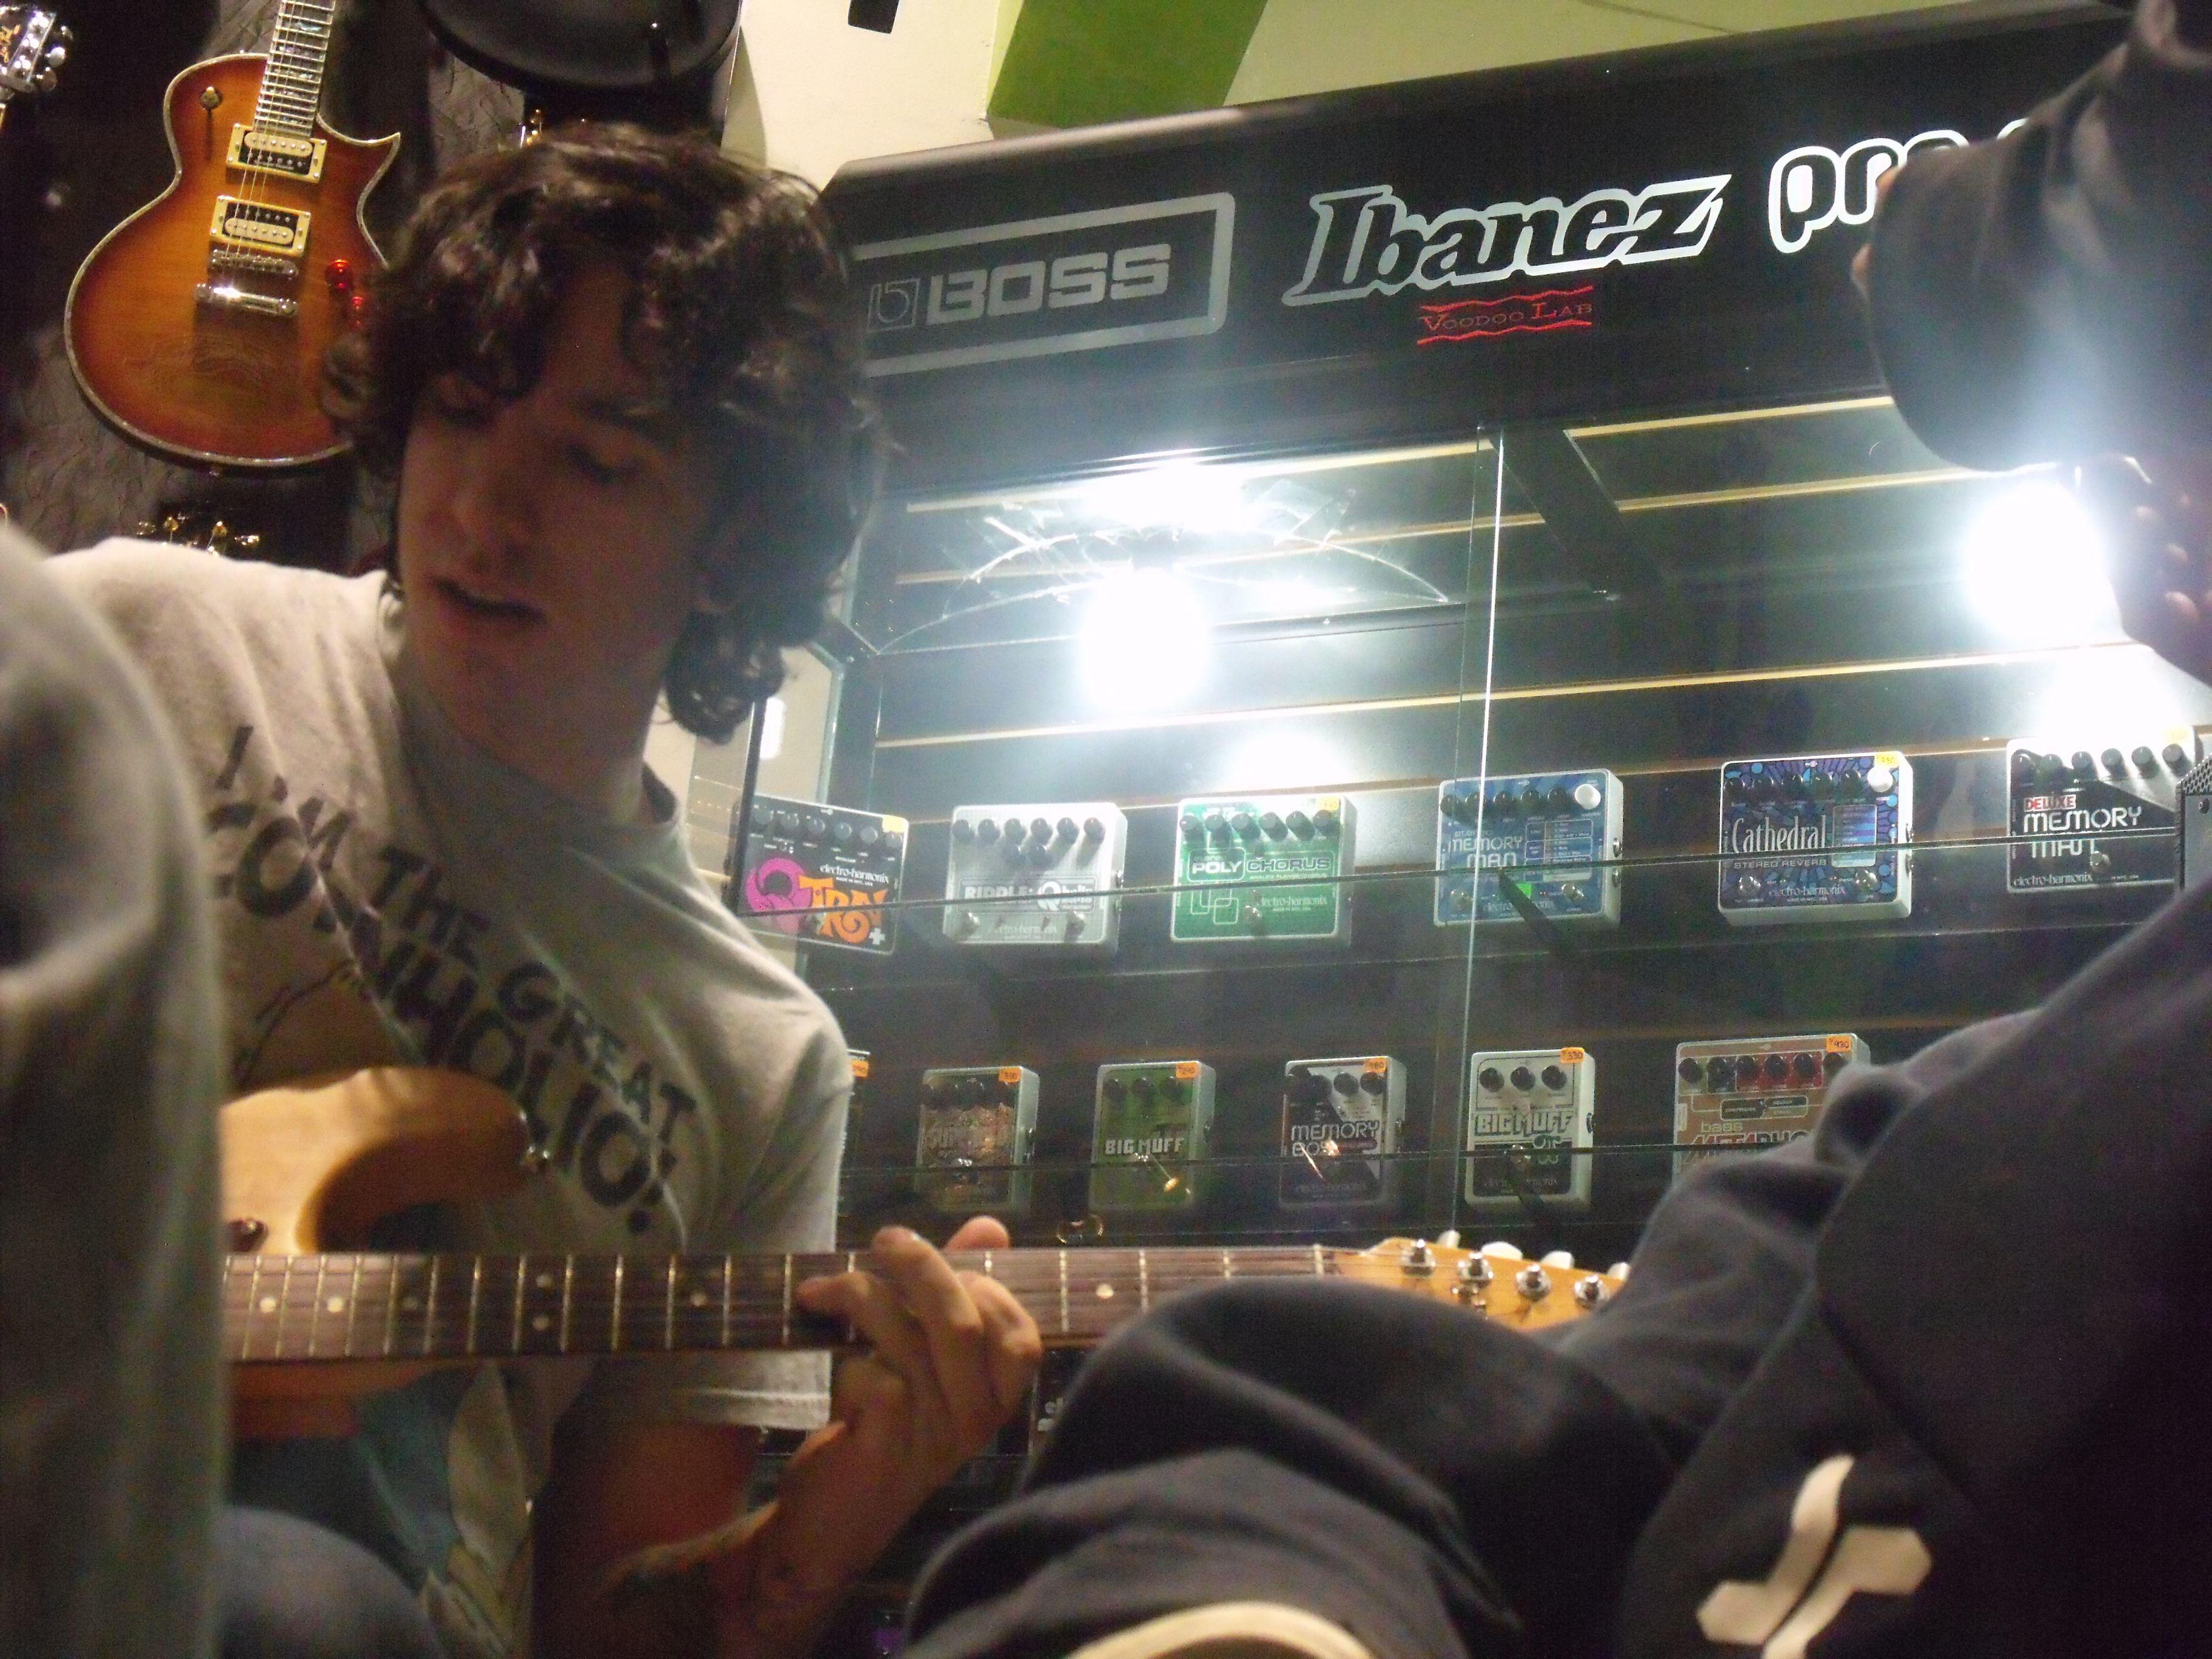 Jose, el guitarrista.